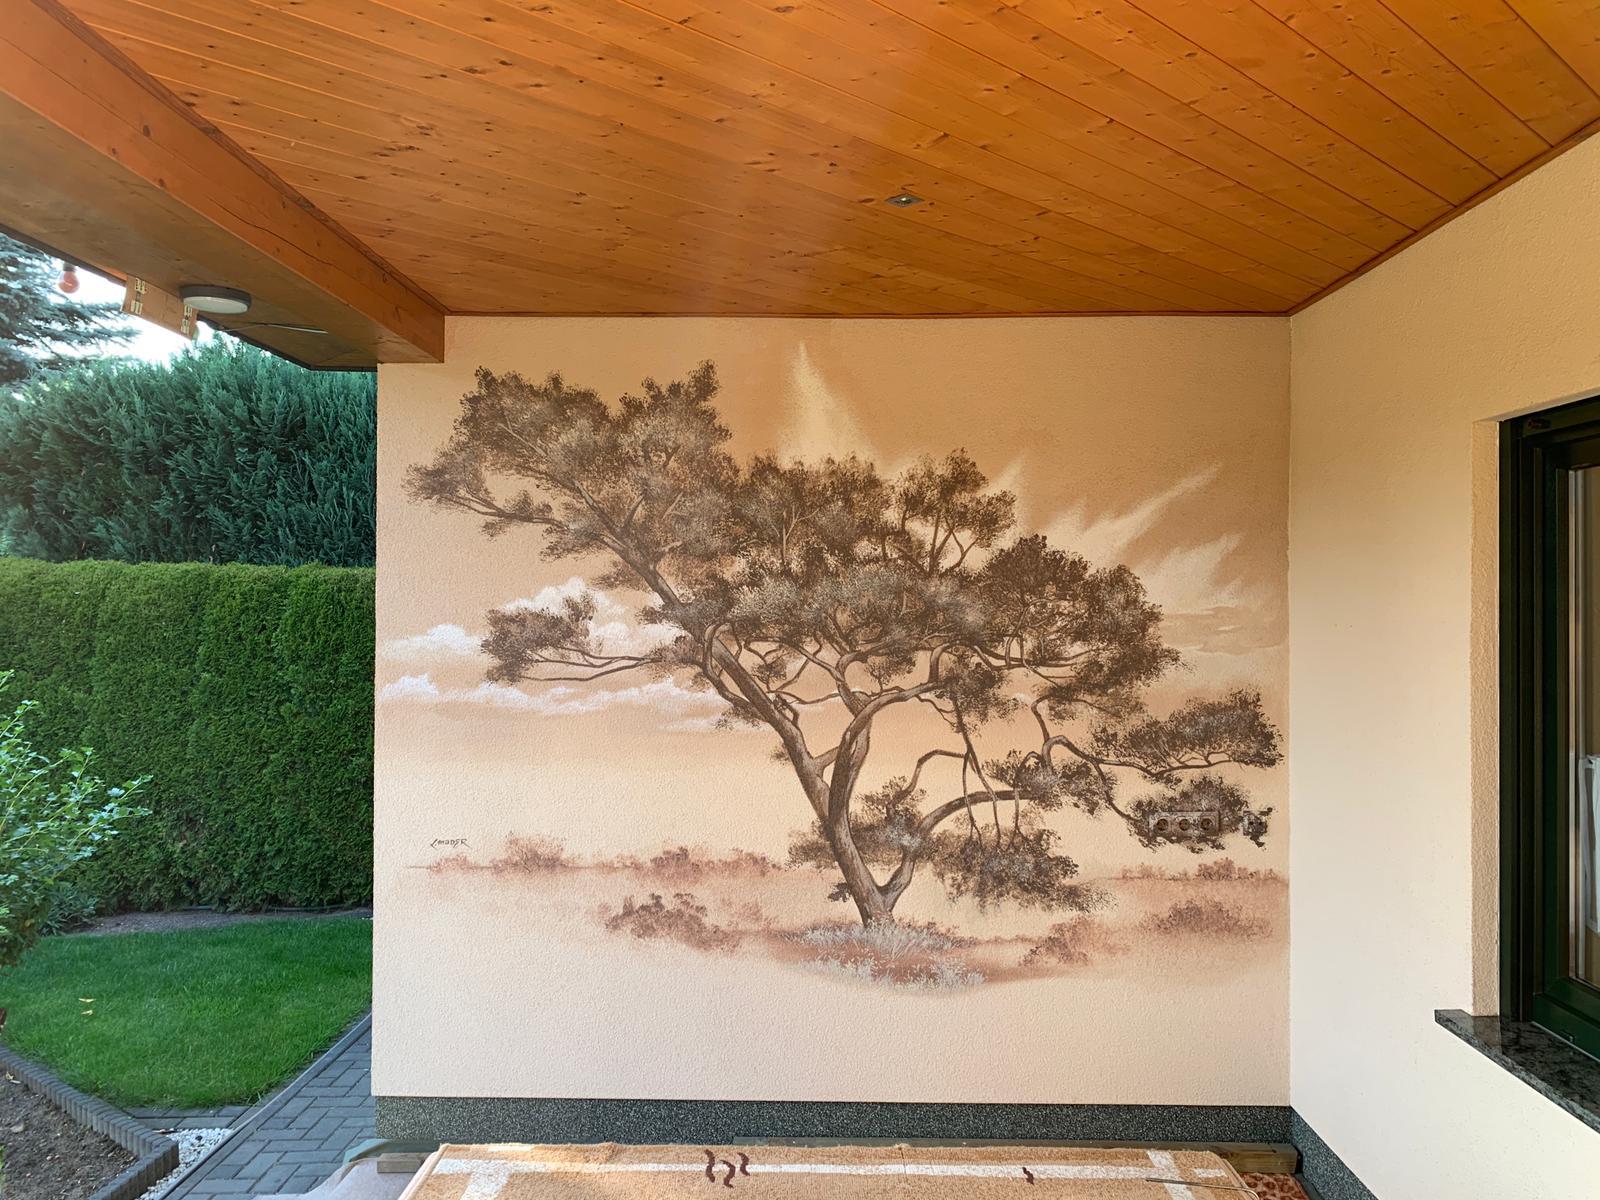 Graffiti Bild Auftrag Baum gemalt